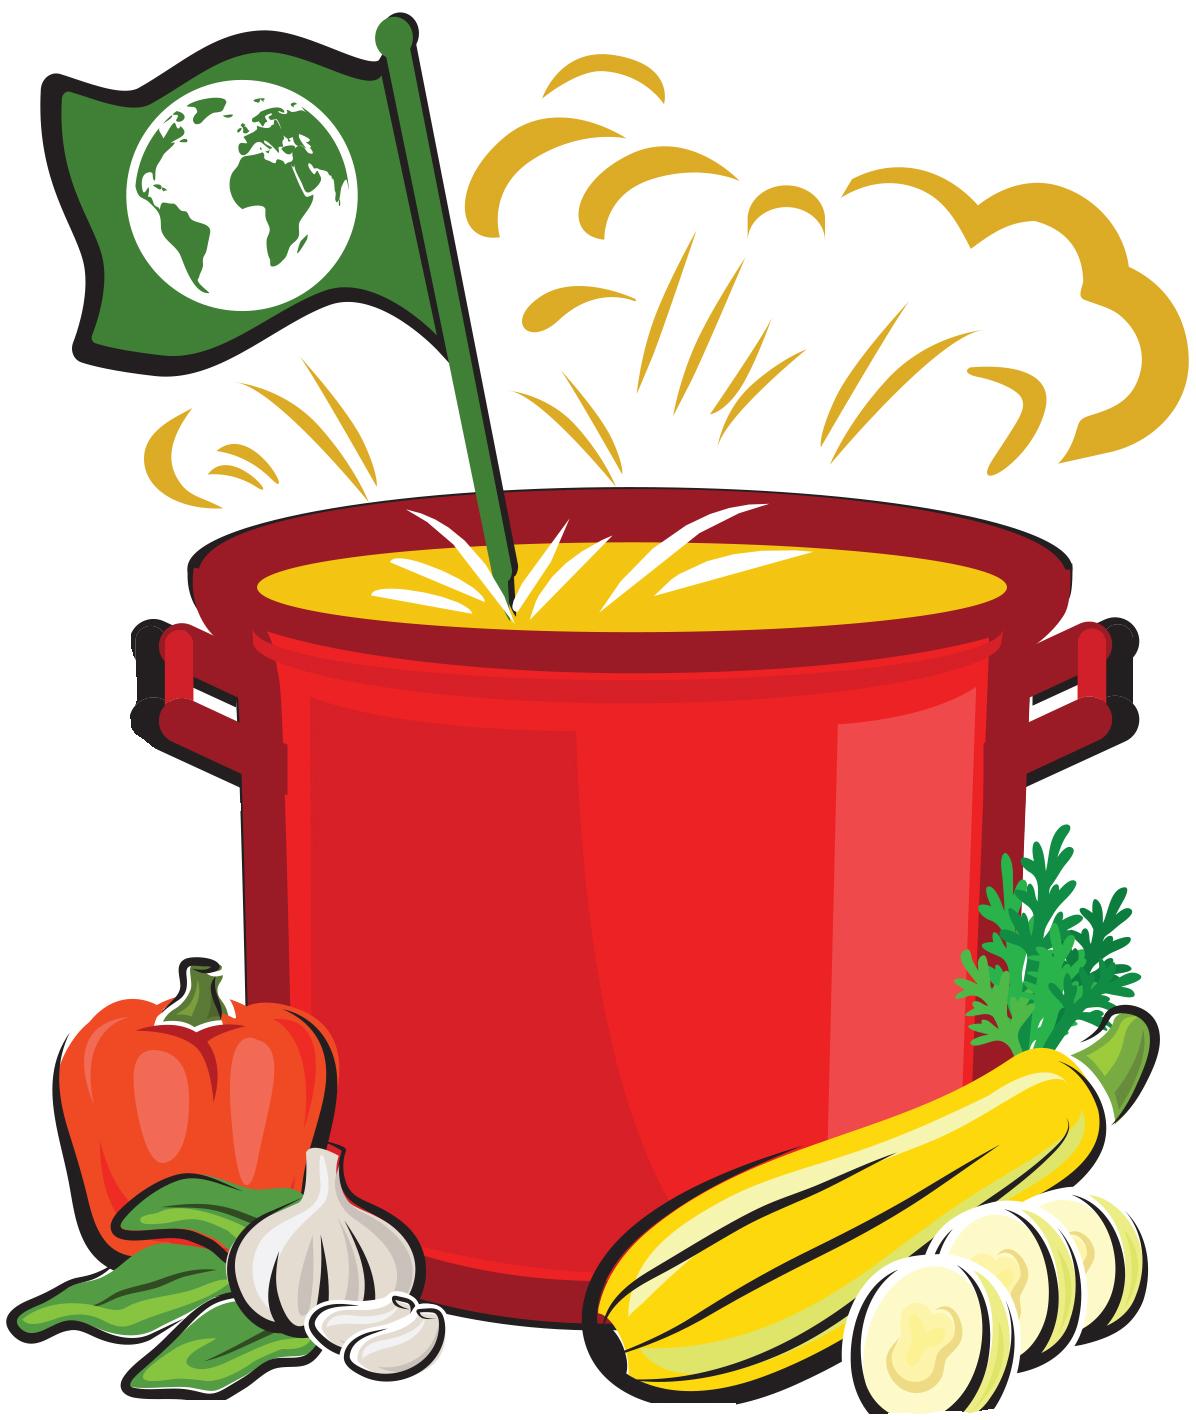 melting pot food tours logo